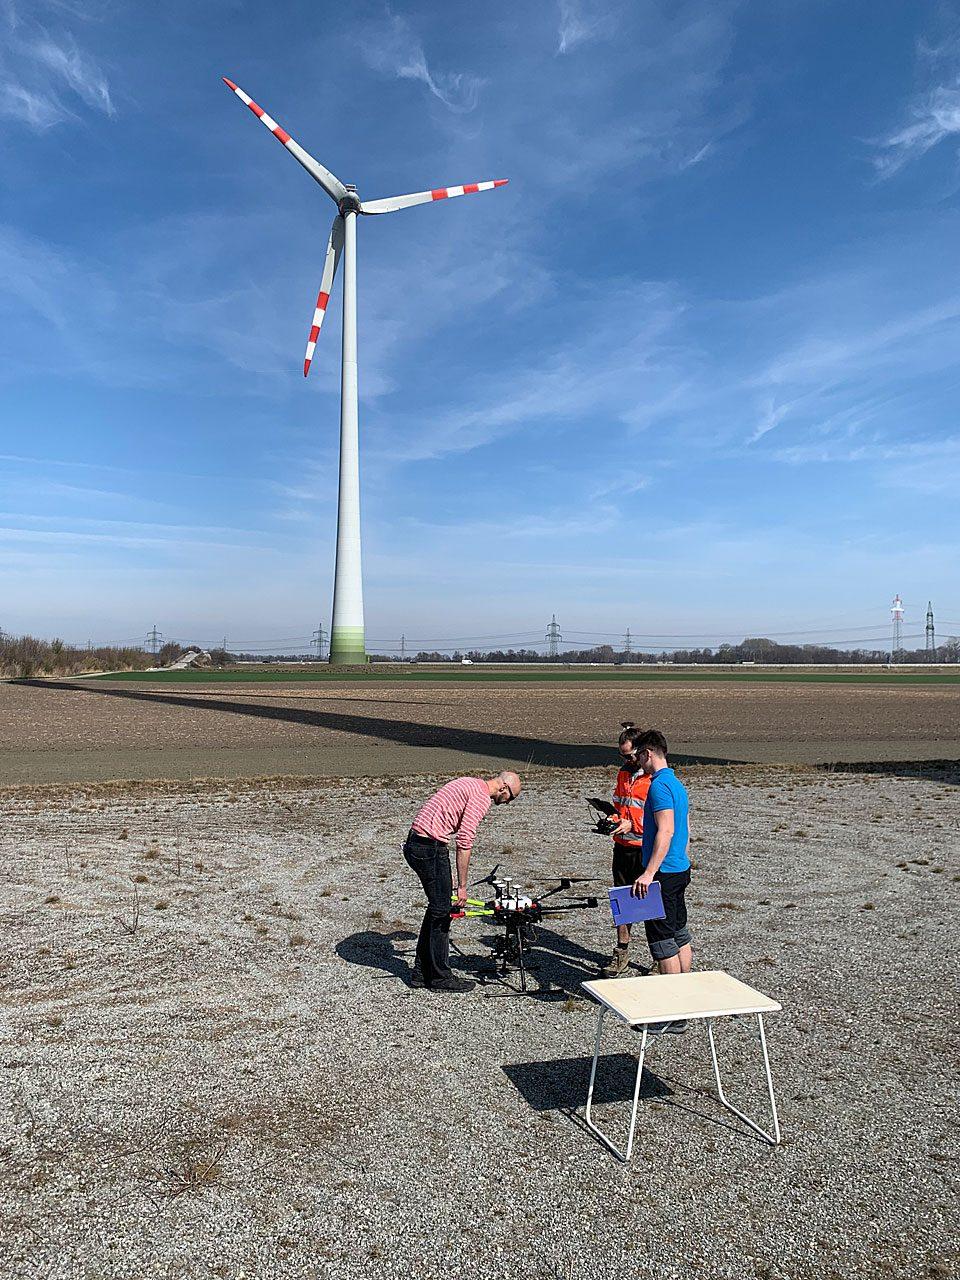 Drohnenwartung mit Skyability - Fotocredit: Energieleben Redaktion